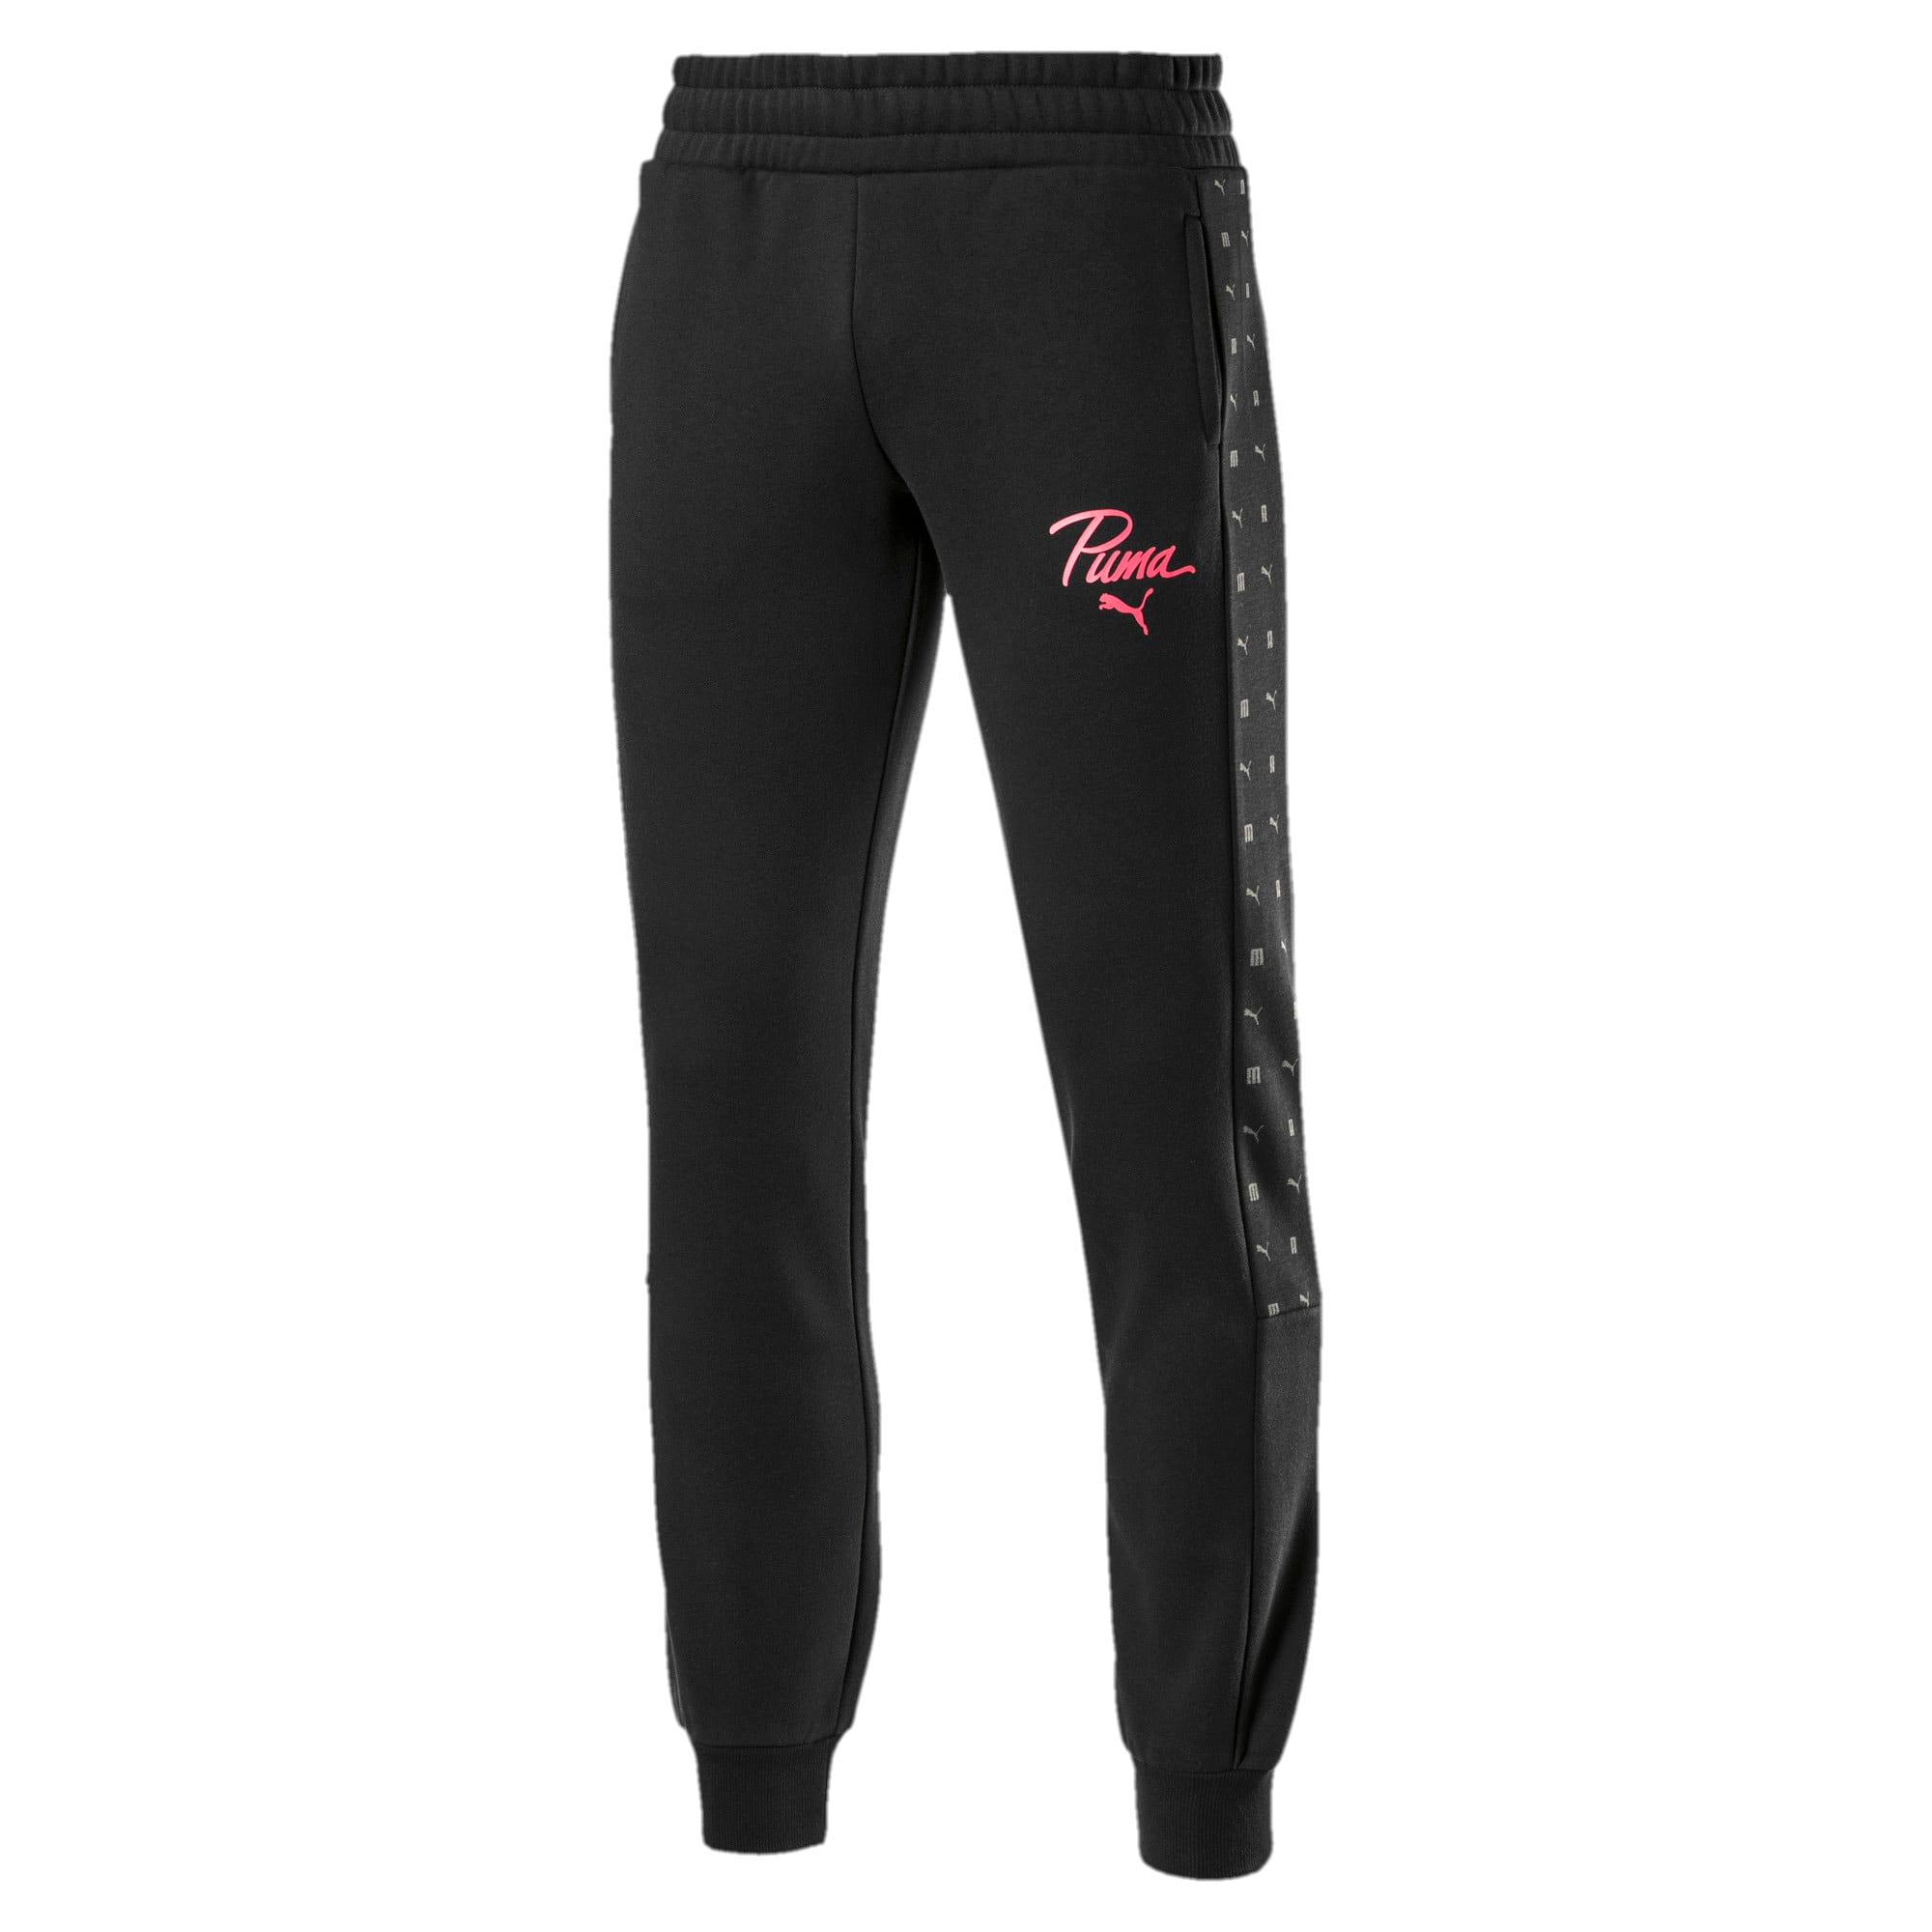 Thumbnail 1 of Logo Pack Graphic Women's Sweatpants, Cotton Black, medium-IND